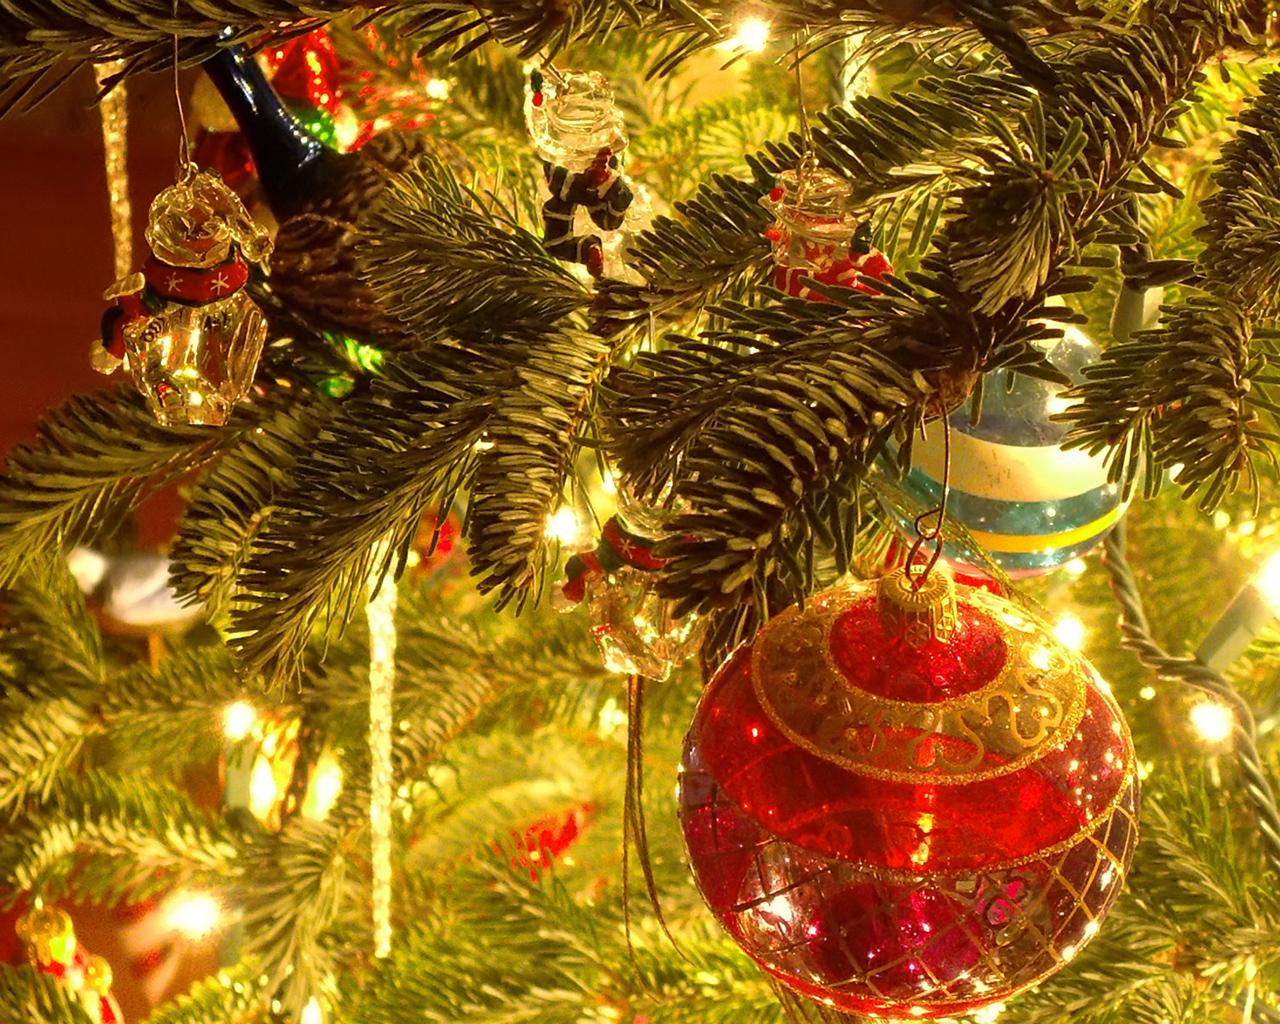 http://1.bp.blogspot.com/-HnpRLC30OQs/TvYJKvhaxzI/AAAAAAAAAG8/v0WkOqNGmZE/s1600/35-Christmas-wallpapers-free-red-christmas-ball-hanging-in-tree-wallpaper.jpg